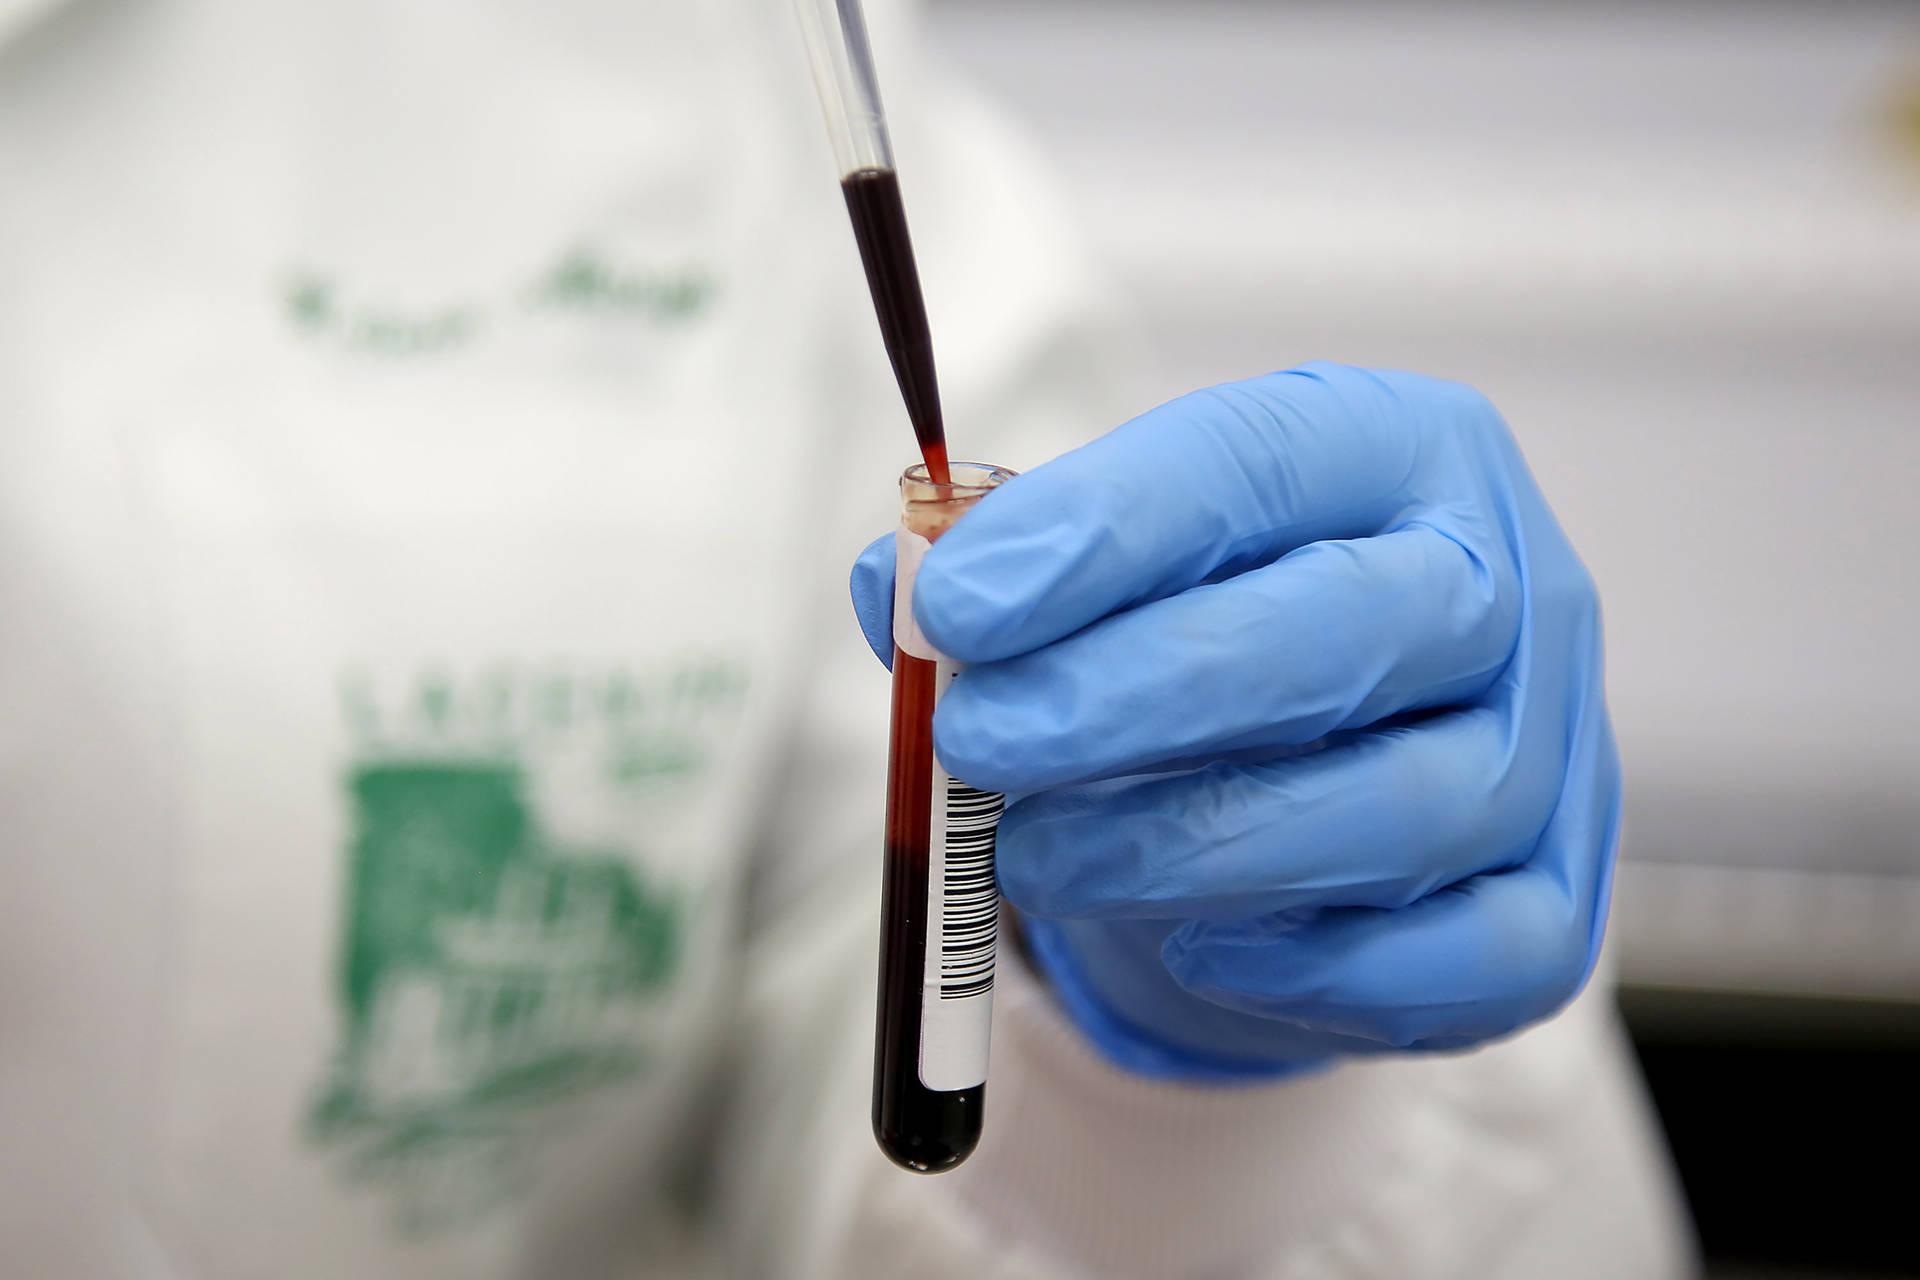 Prefeitura de Maringá confirma duas mortes pelo novo coronavírus